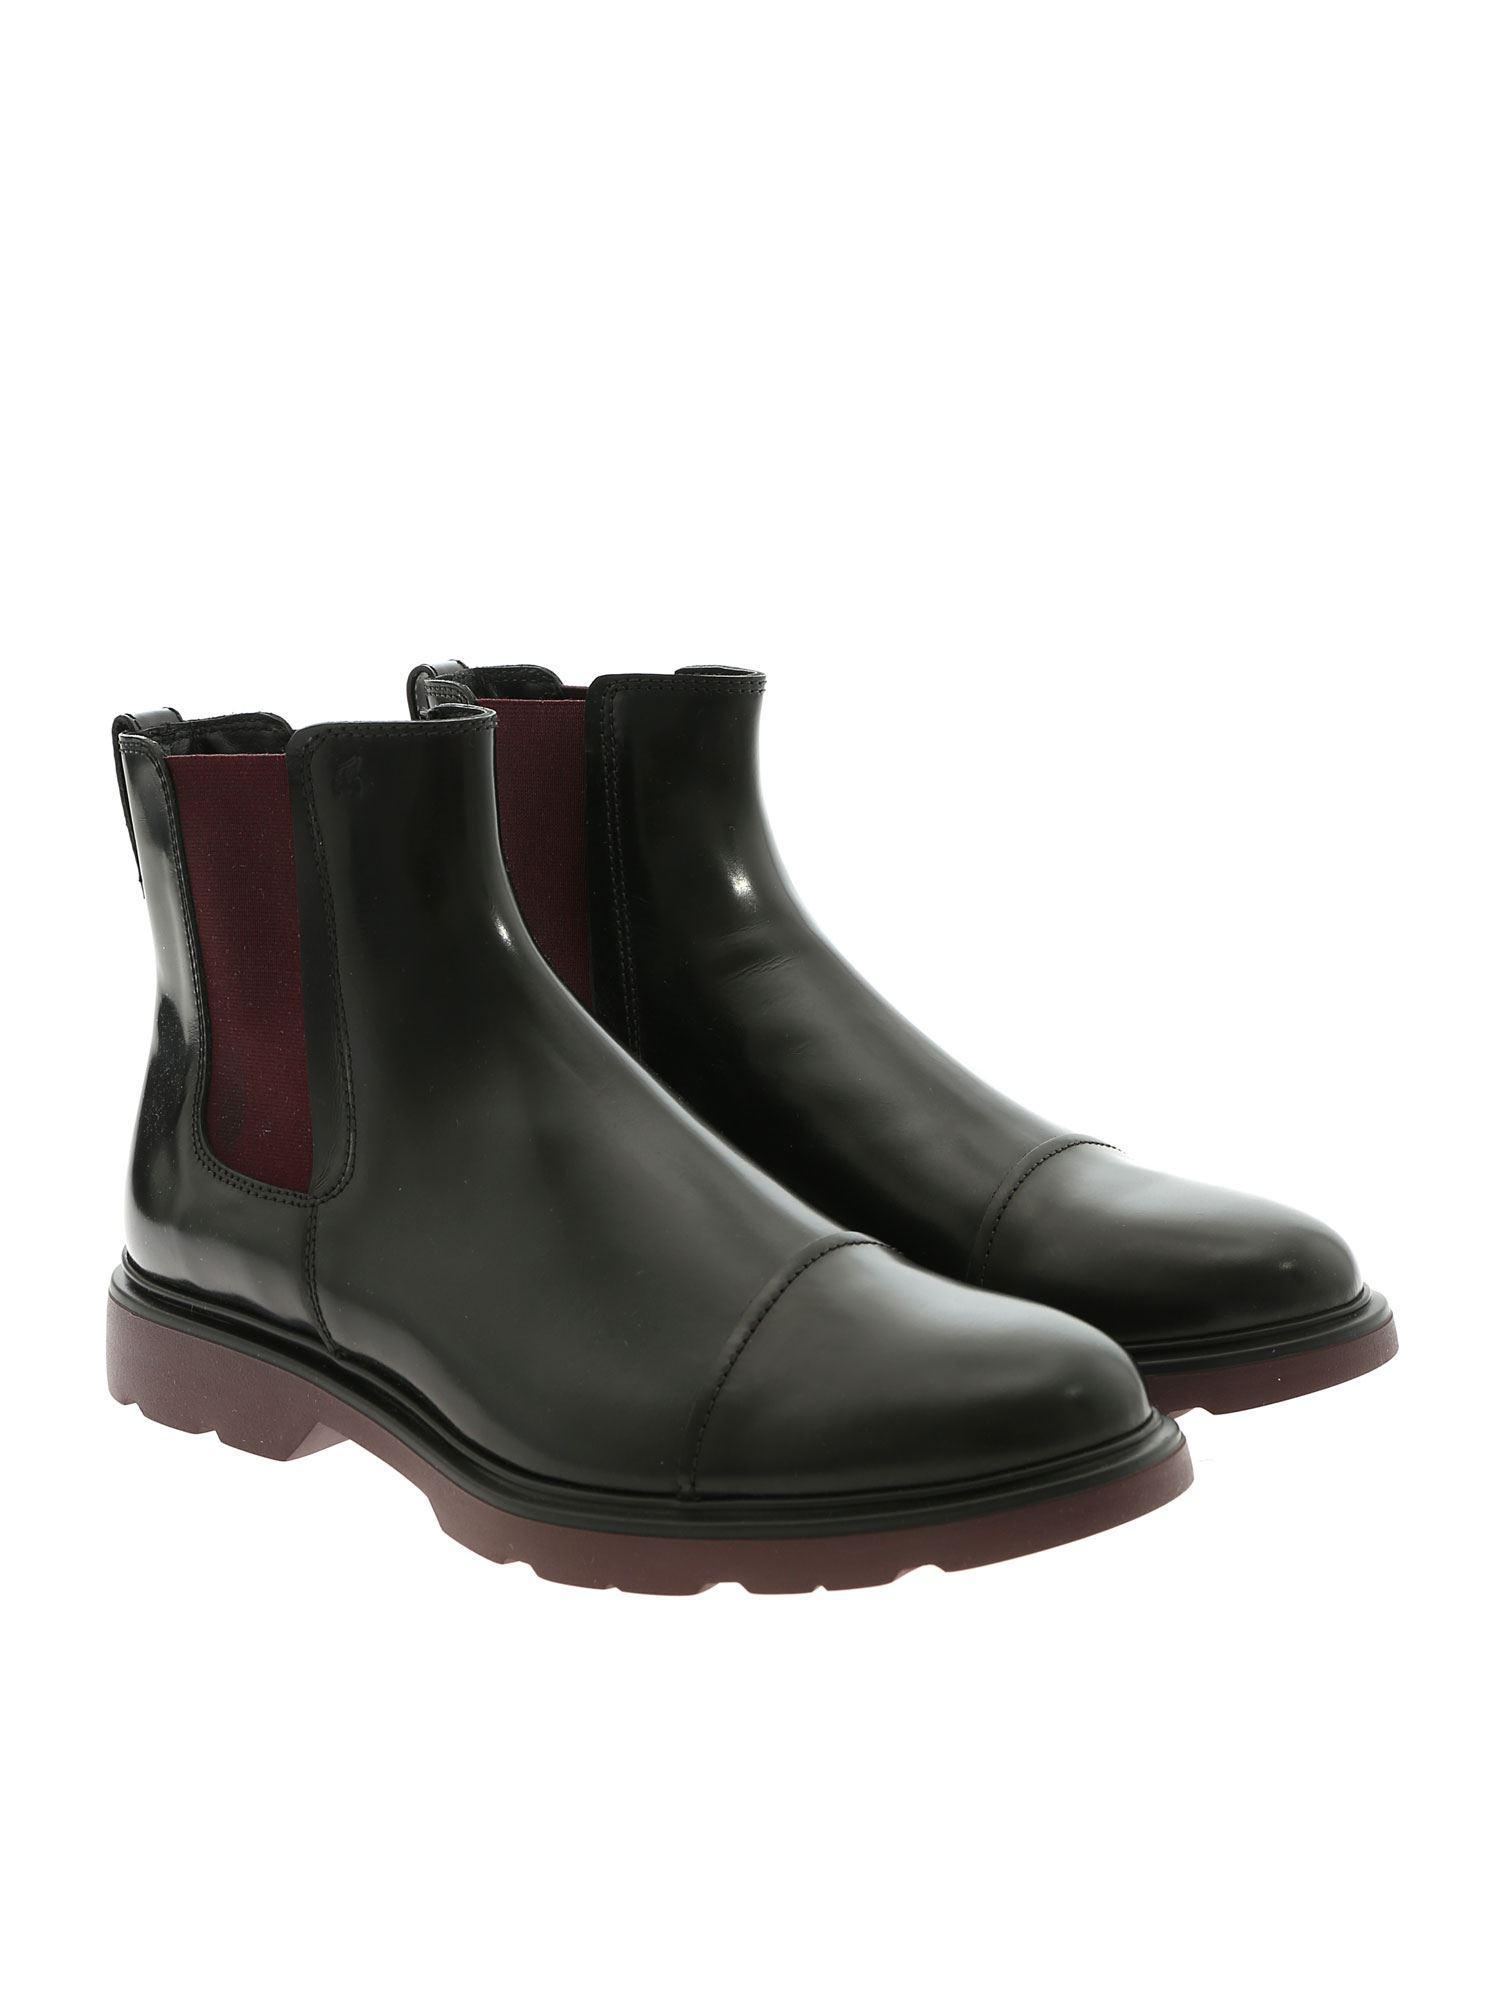 Lyst - Hogan H304 Black Chelsea Ankle Boots in Black for Men - Save 10% 18525bbb4ea